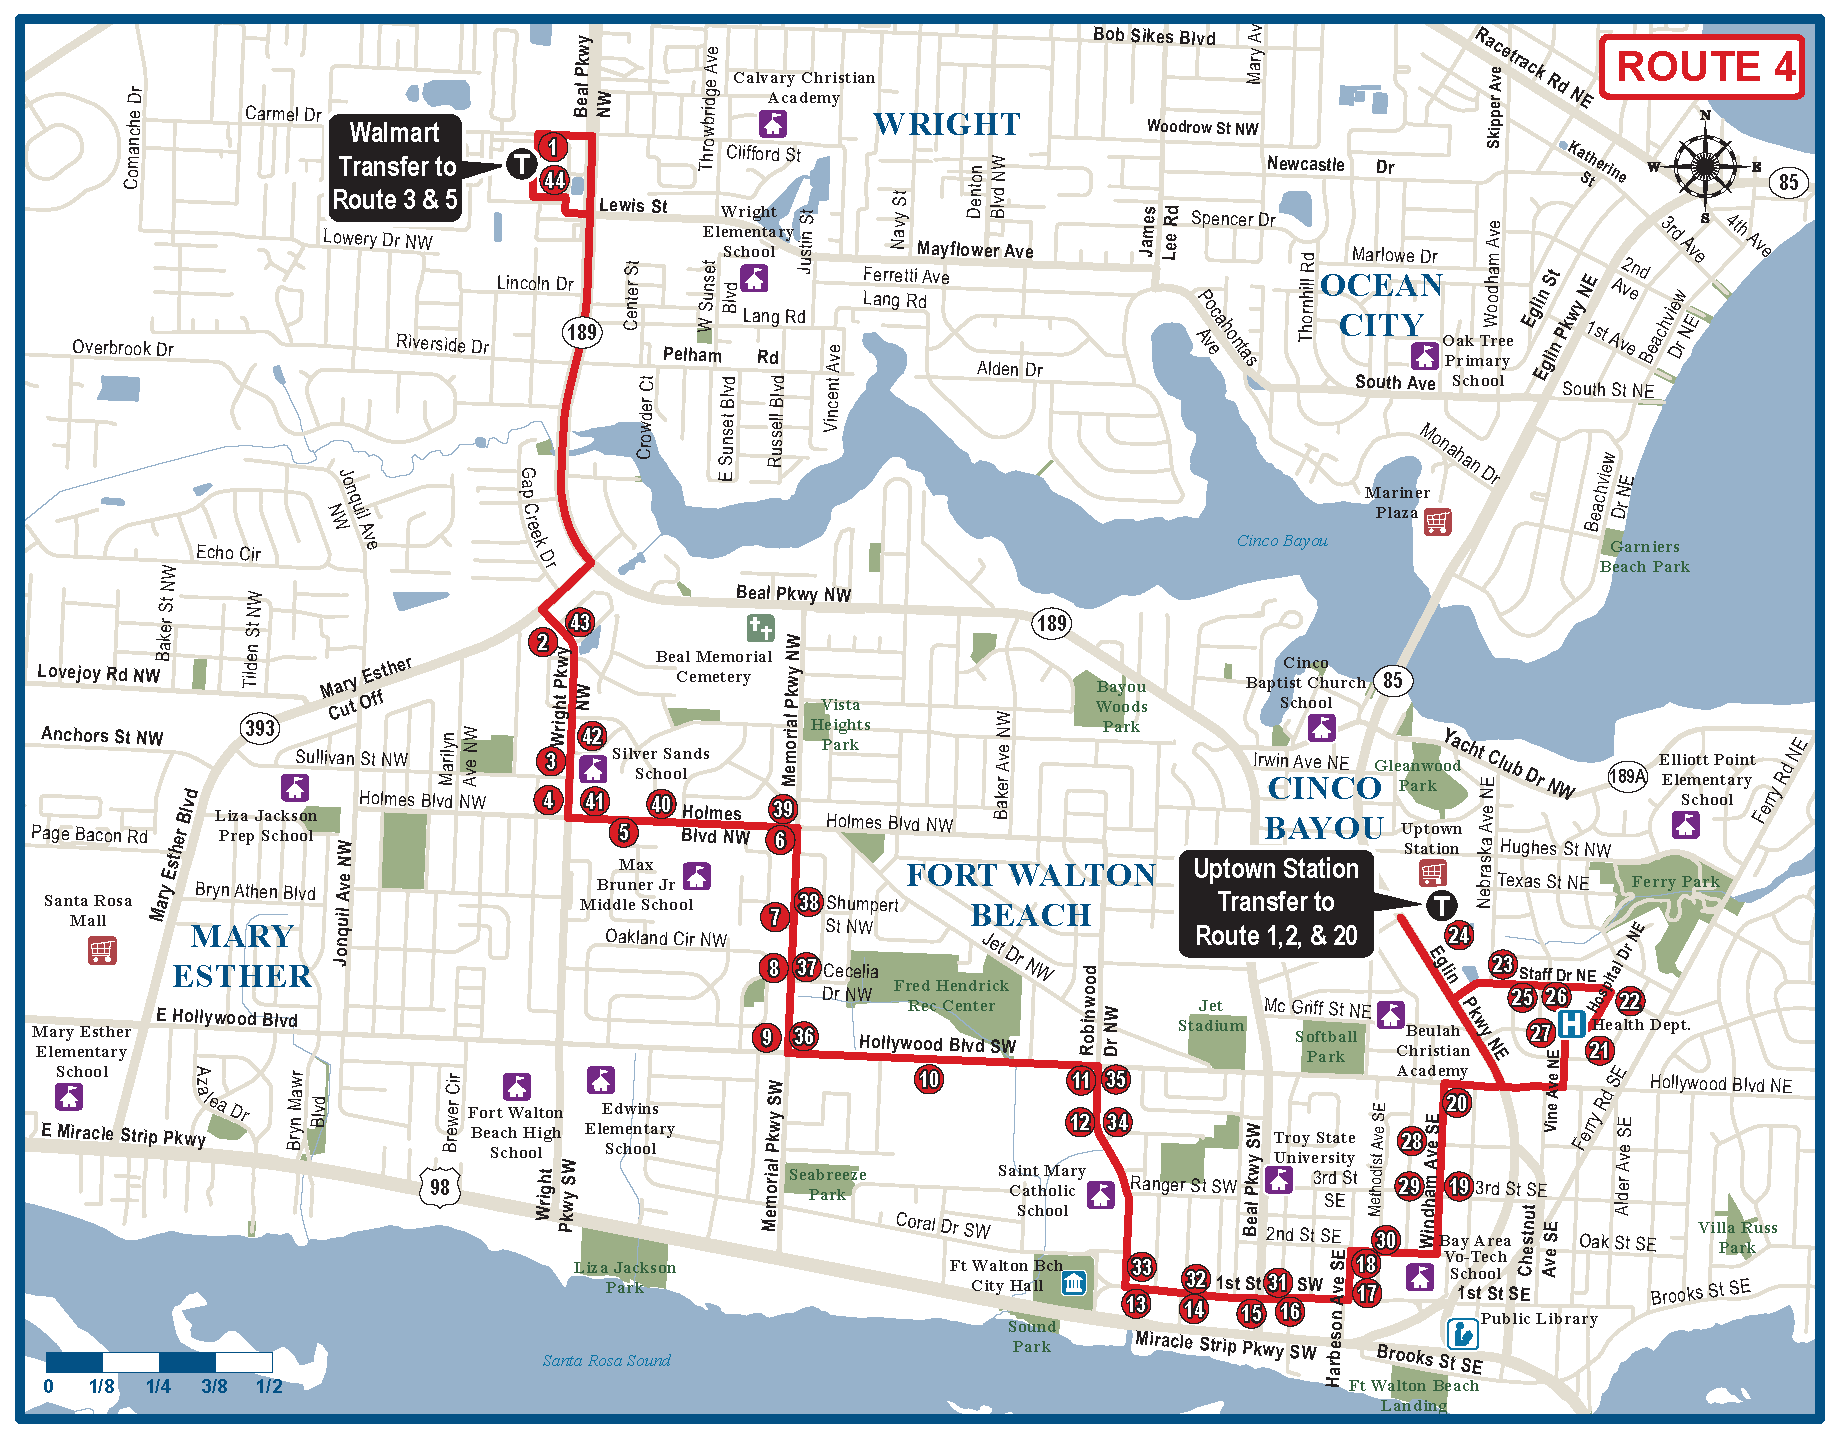 Map Of Fort Walton Beach Florida.Fort Walton Beach Route 4 Ec Rider